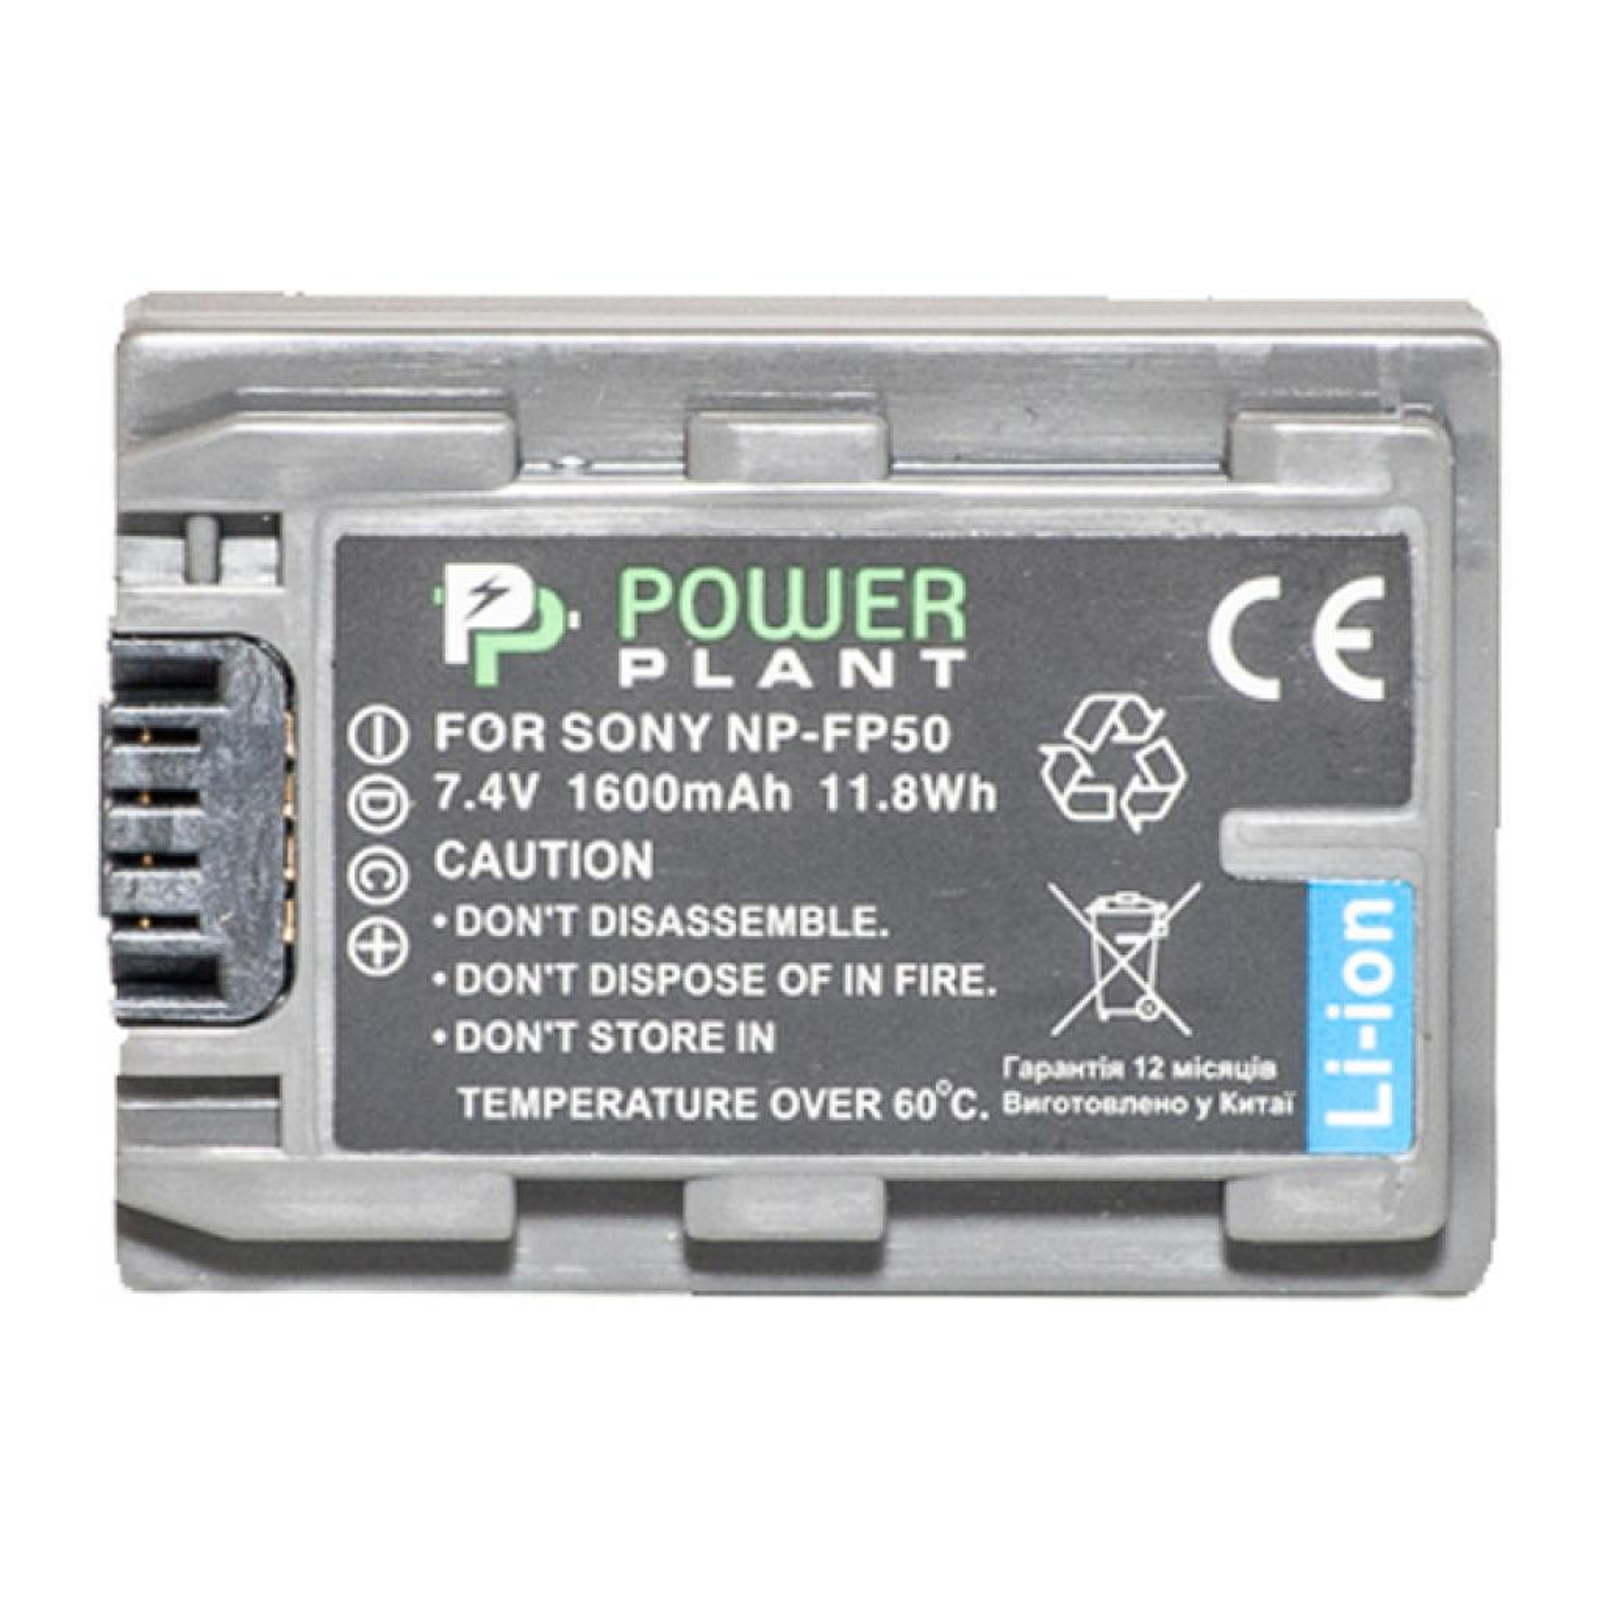 Аккумулятор к фото/видео PowerPlant Sony NP-FP50 (DV00DV1025) изображение 2